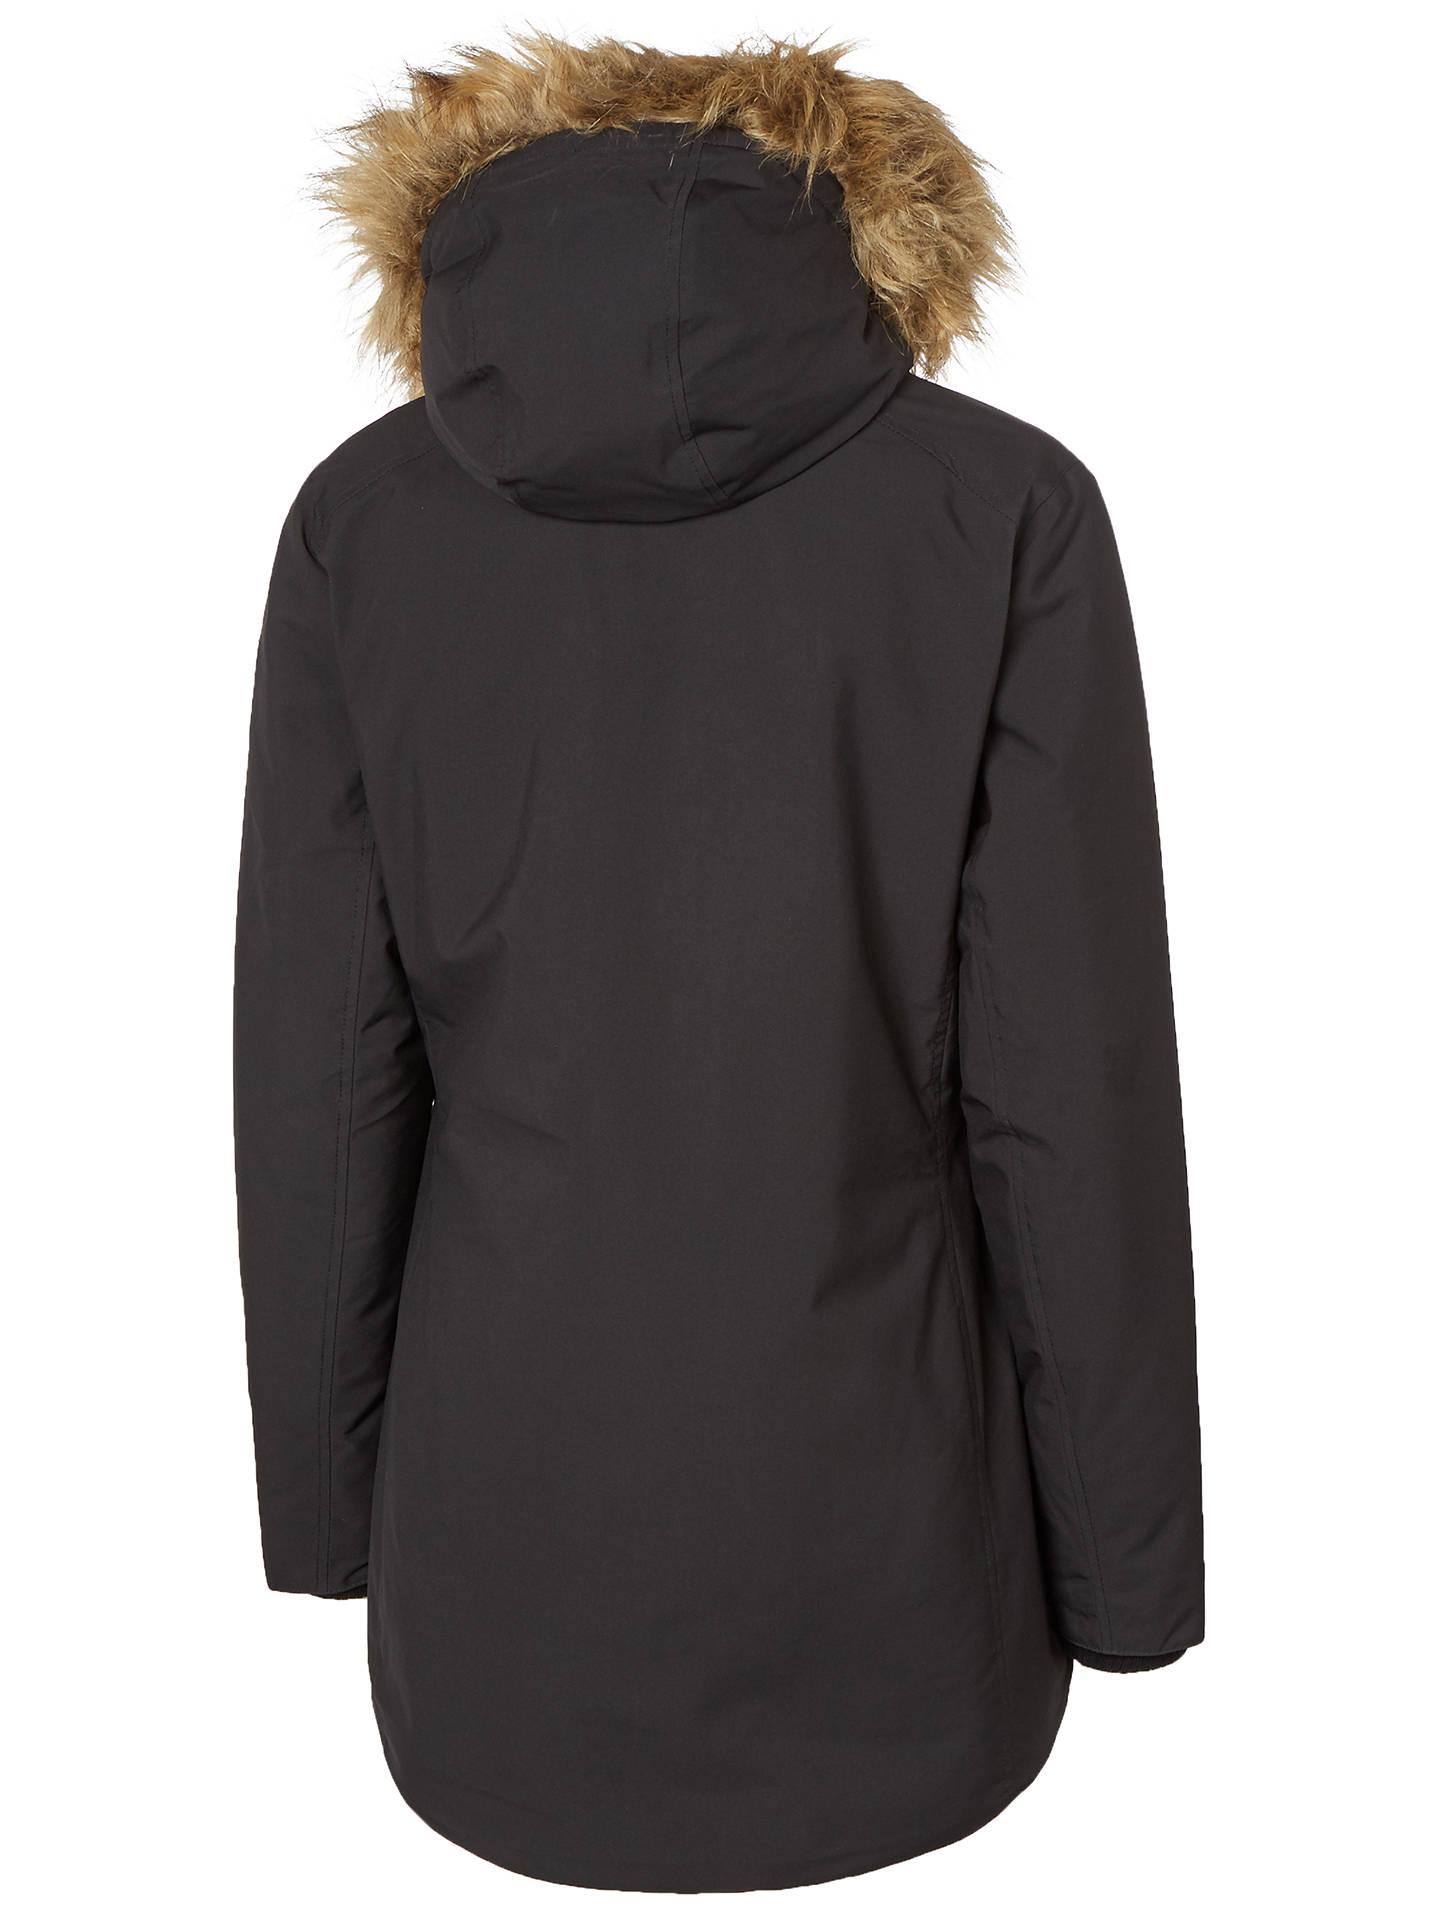 b97c66c3ef ... BuyHelly Hansen Eira Waterproof Insulated Women s Jacket